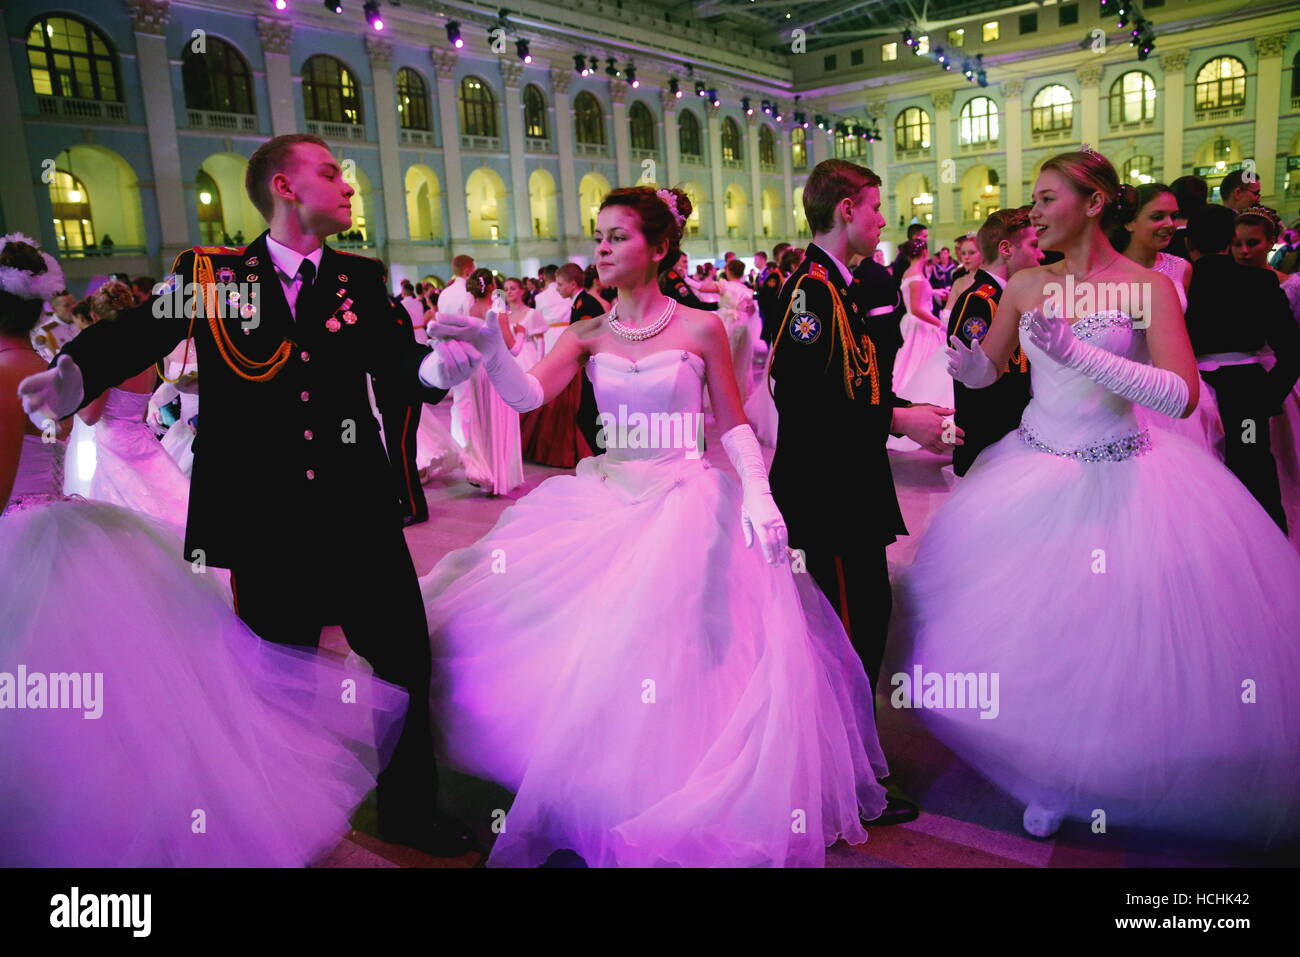 Ball Gowns Imágenes De Stock & Ball Gowns Fotos De Stock - Alamy